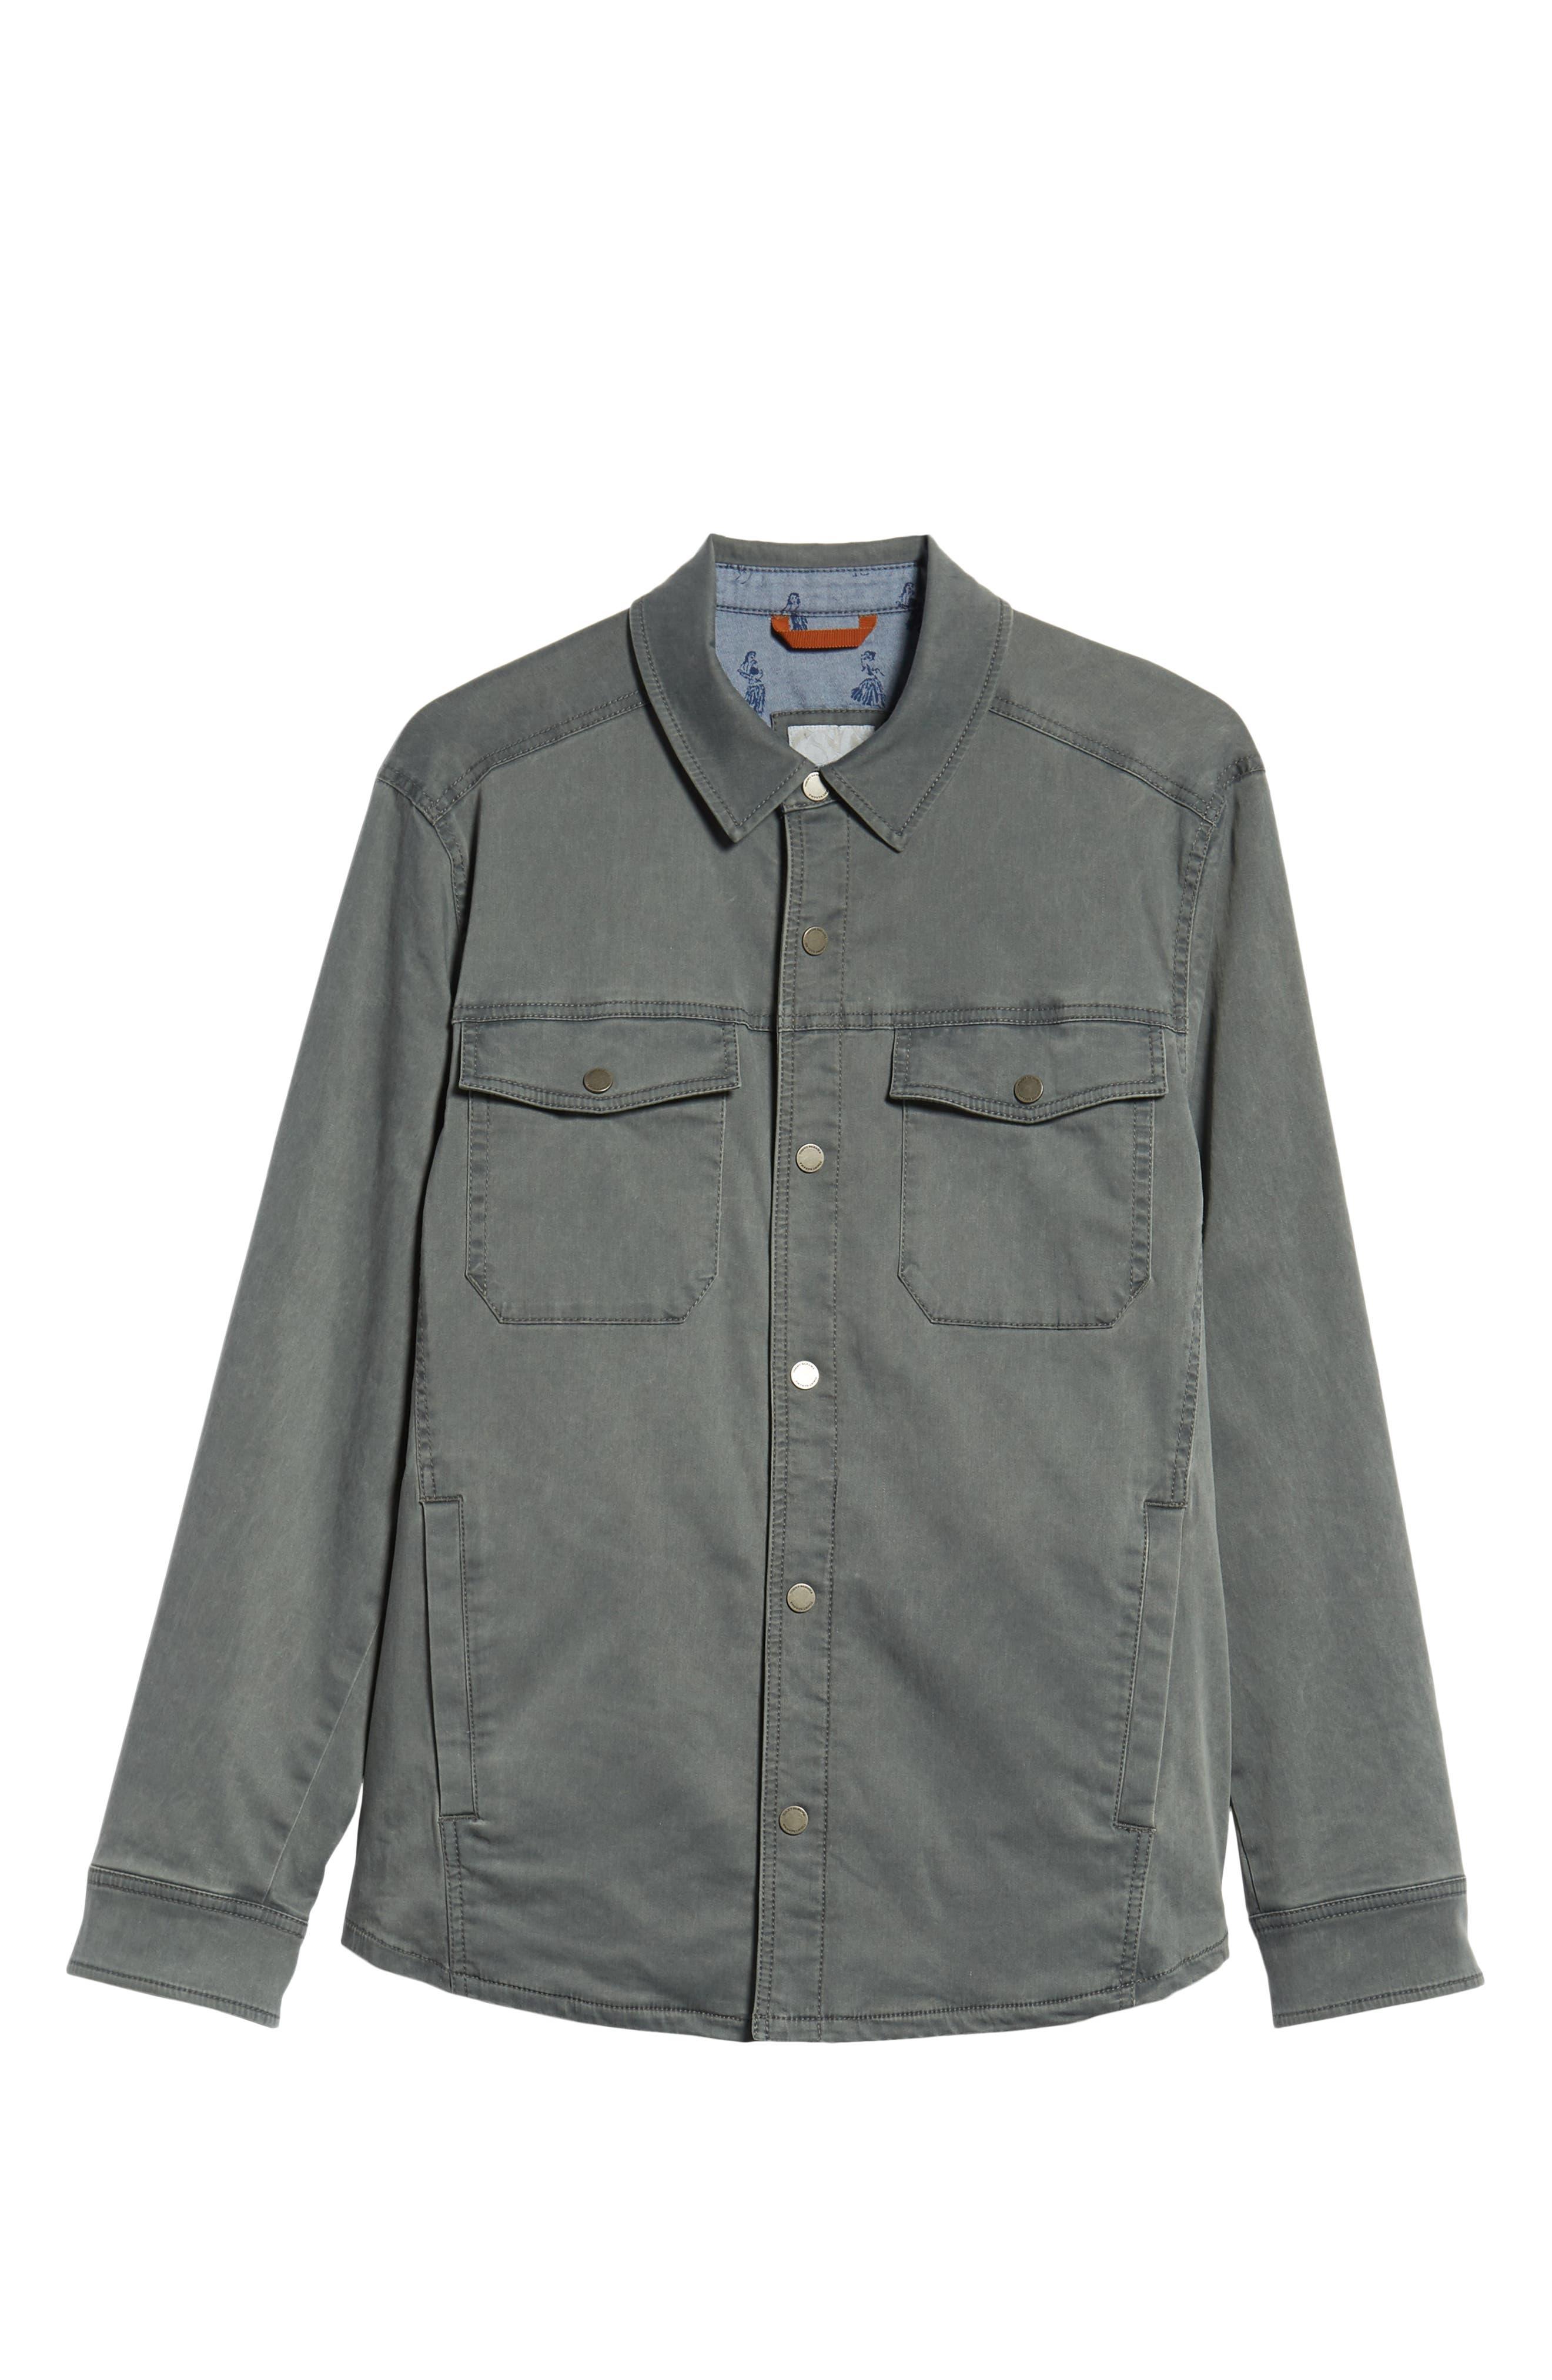 Boracay Regular Fit Shirt Jacket,                             Alternate thumbnail 6, color,                             FOG GREY